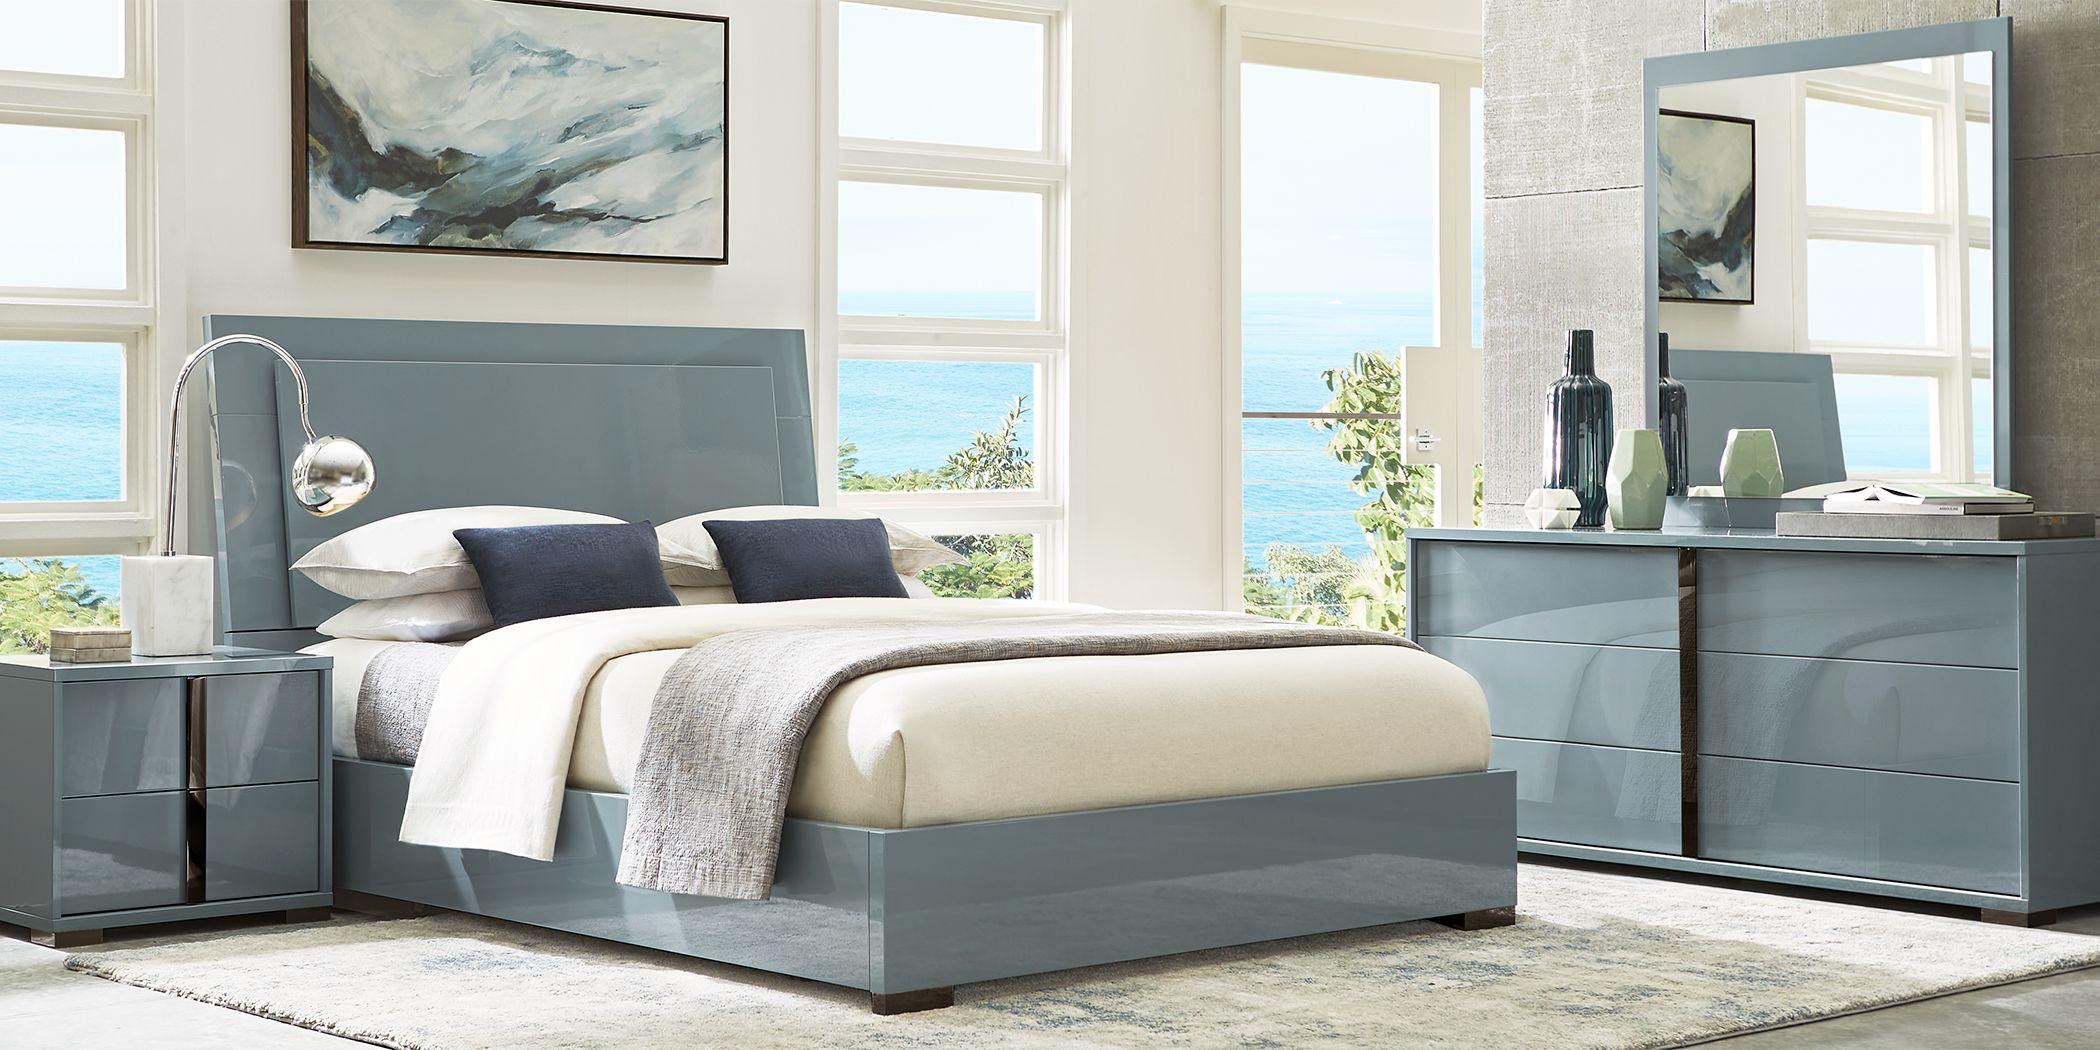 Luma Vista Blue 5 Pc King Bedroom